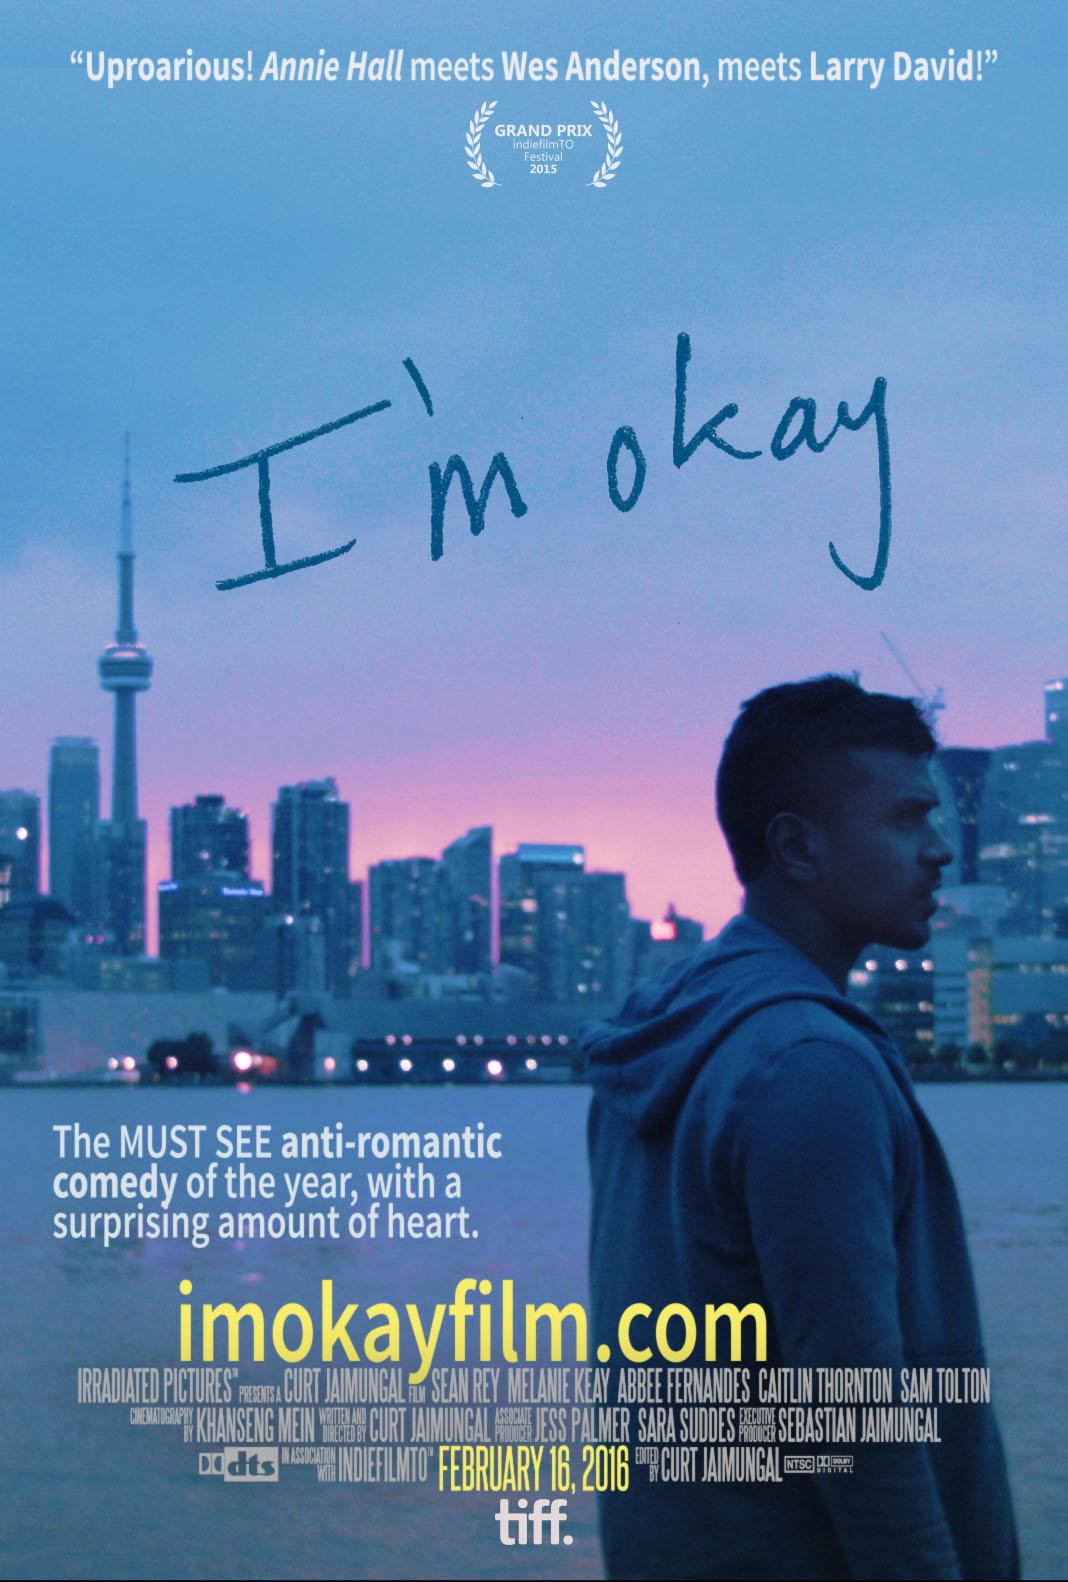 I'm Okay Film Promotion